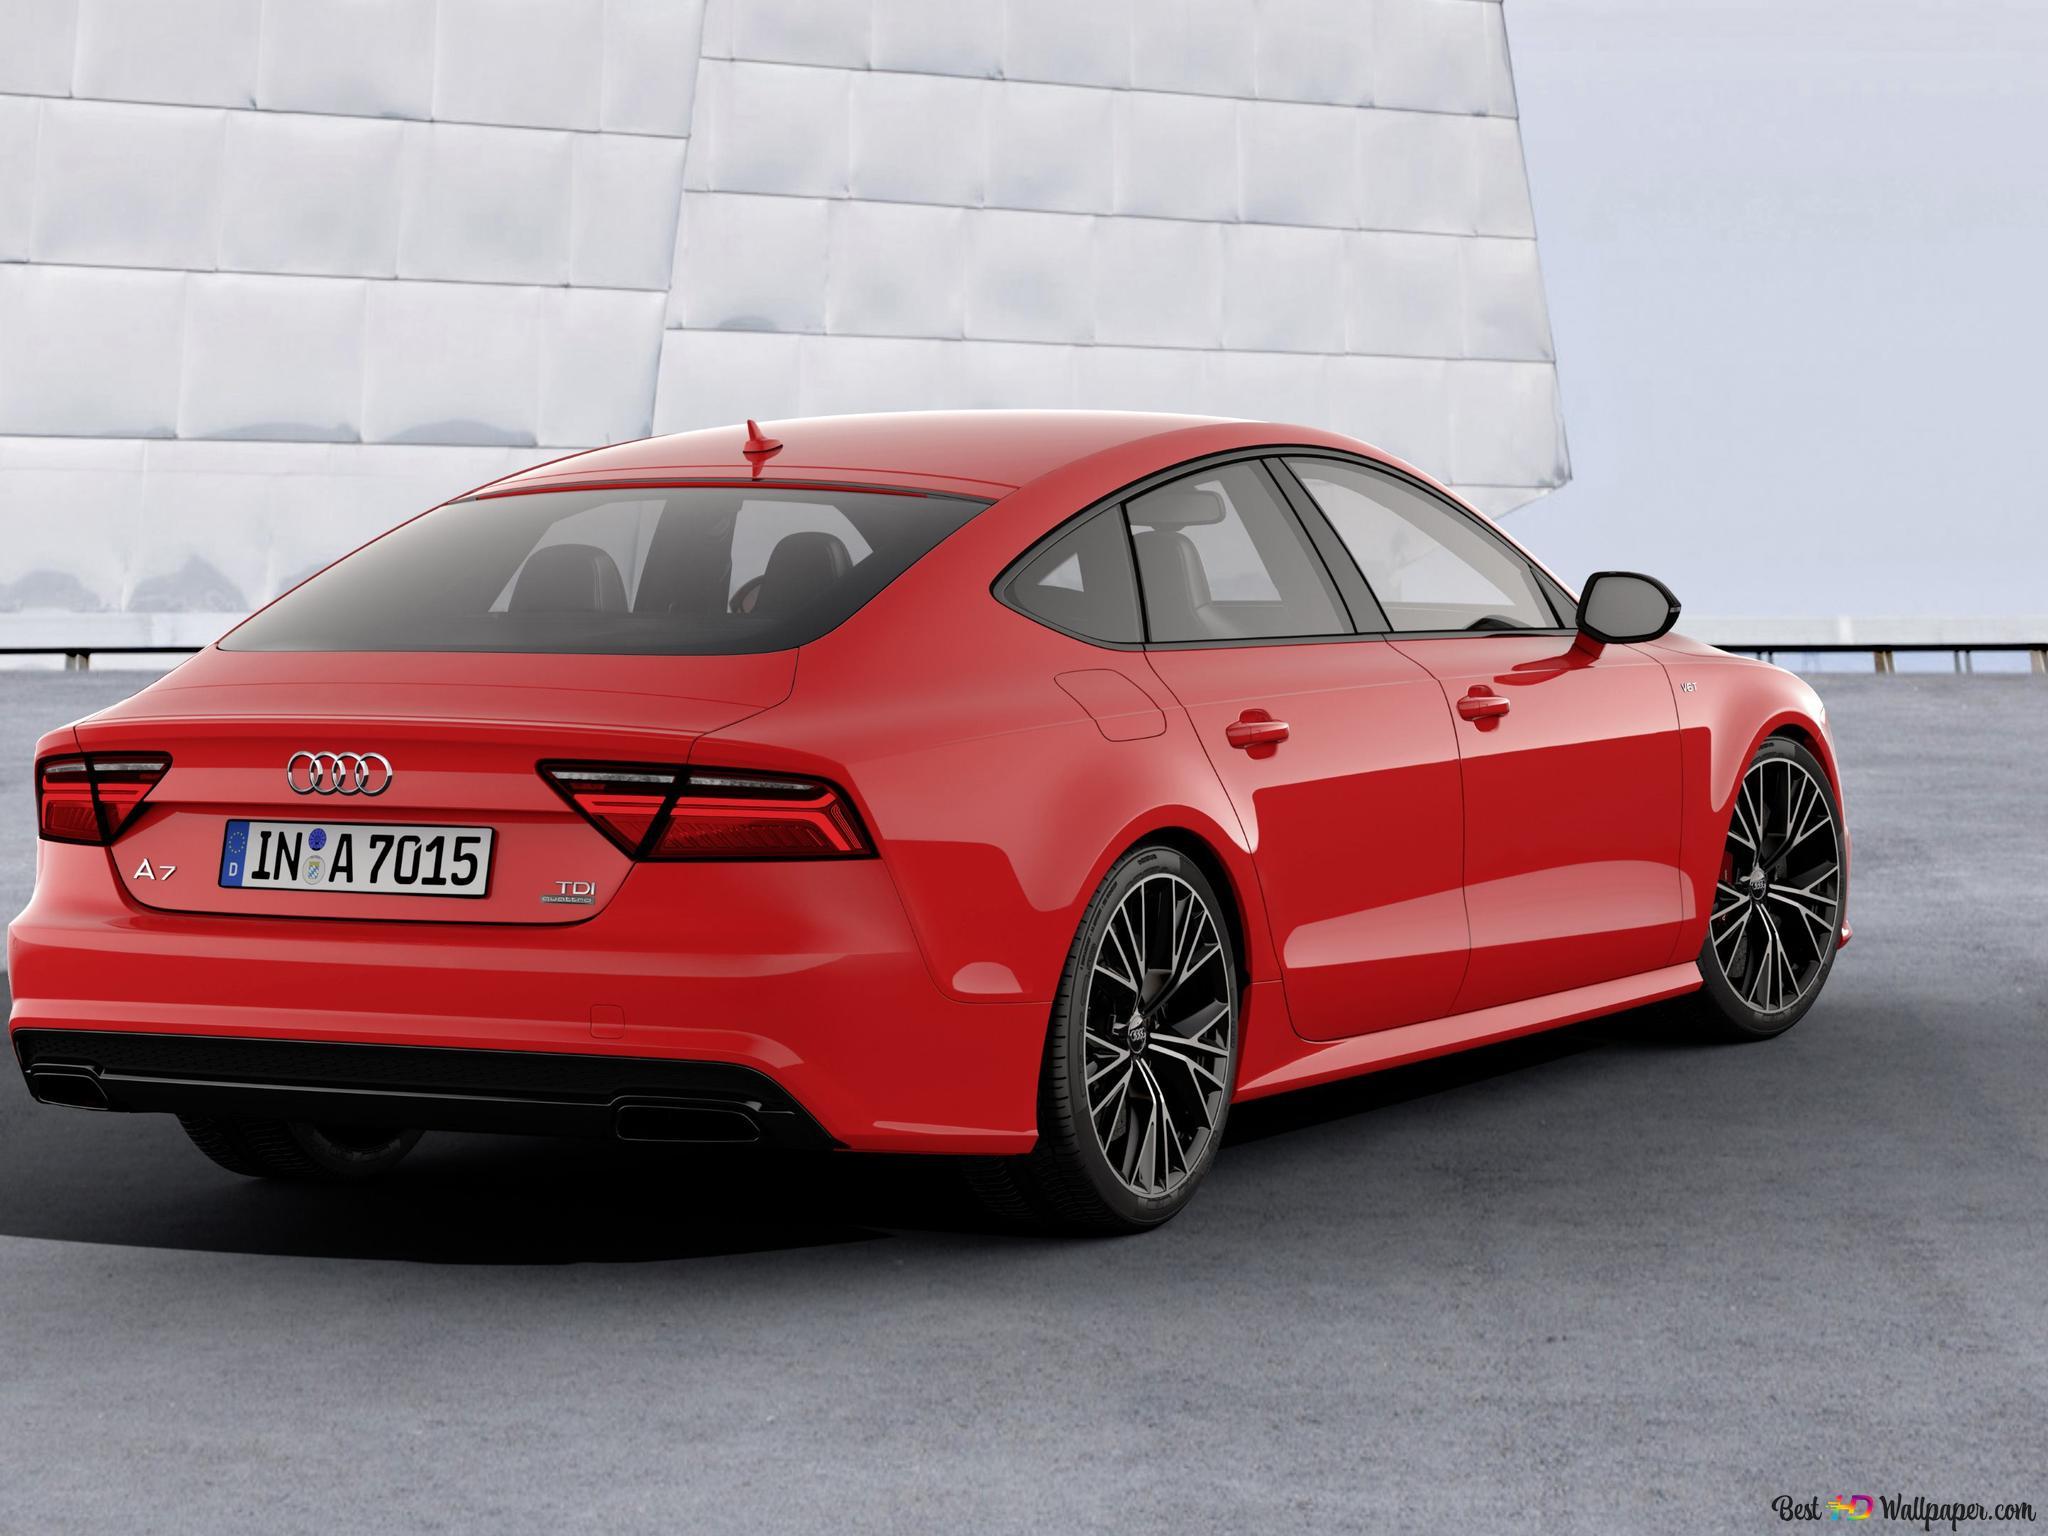 Red Audi A7 Hd Wallpaper Download